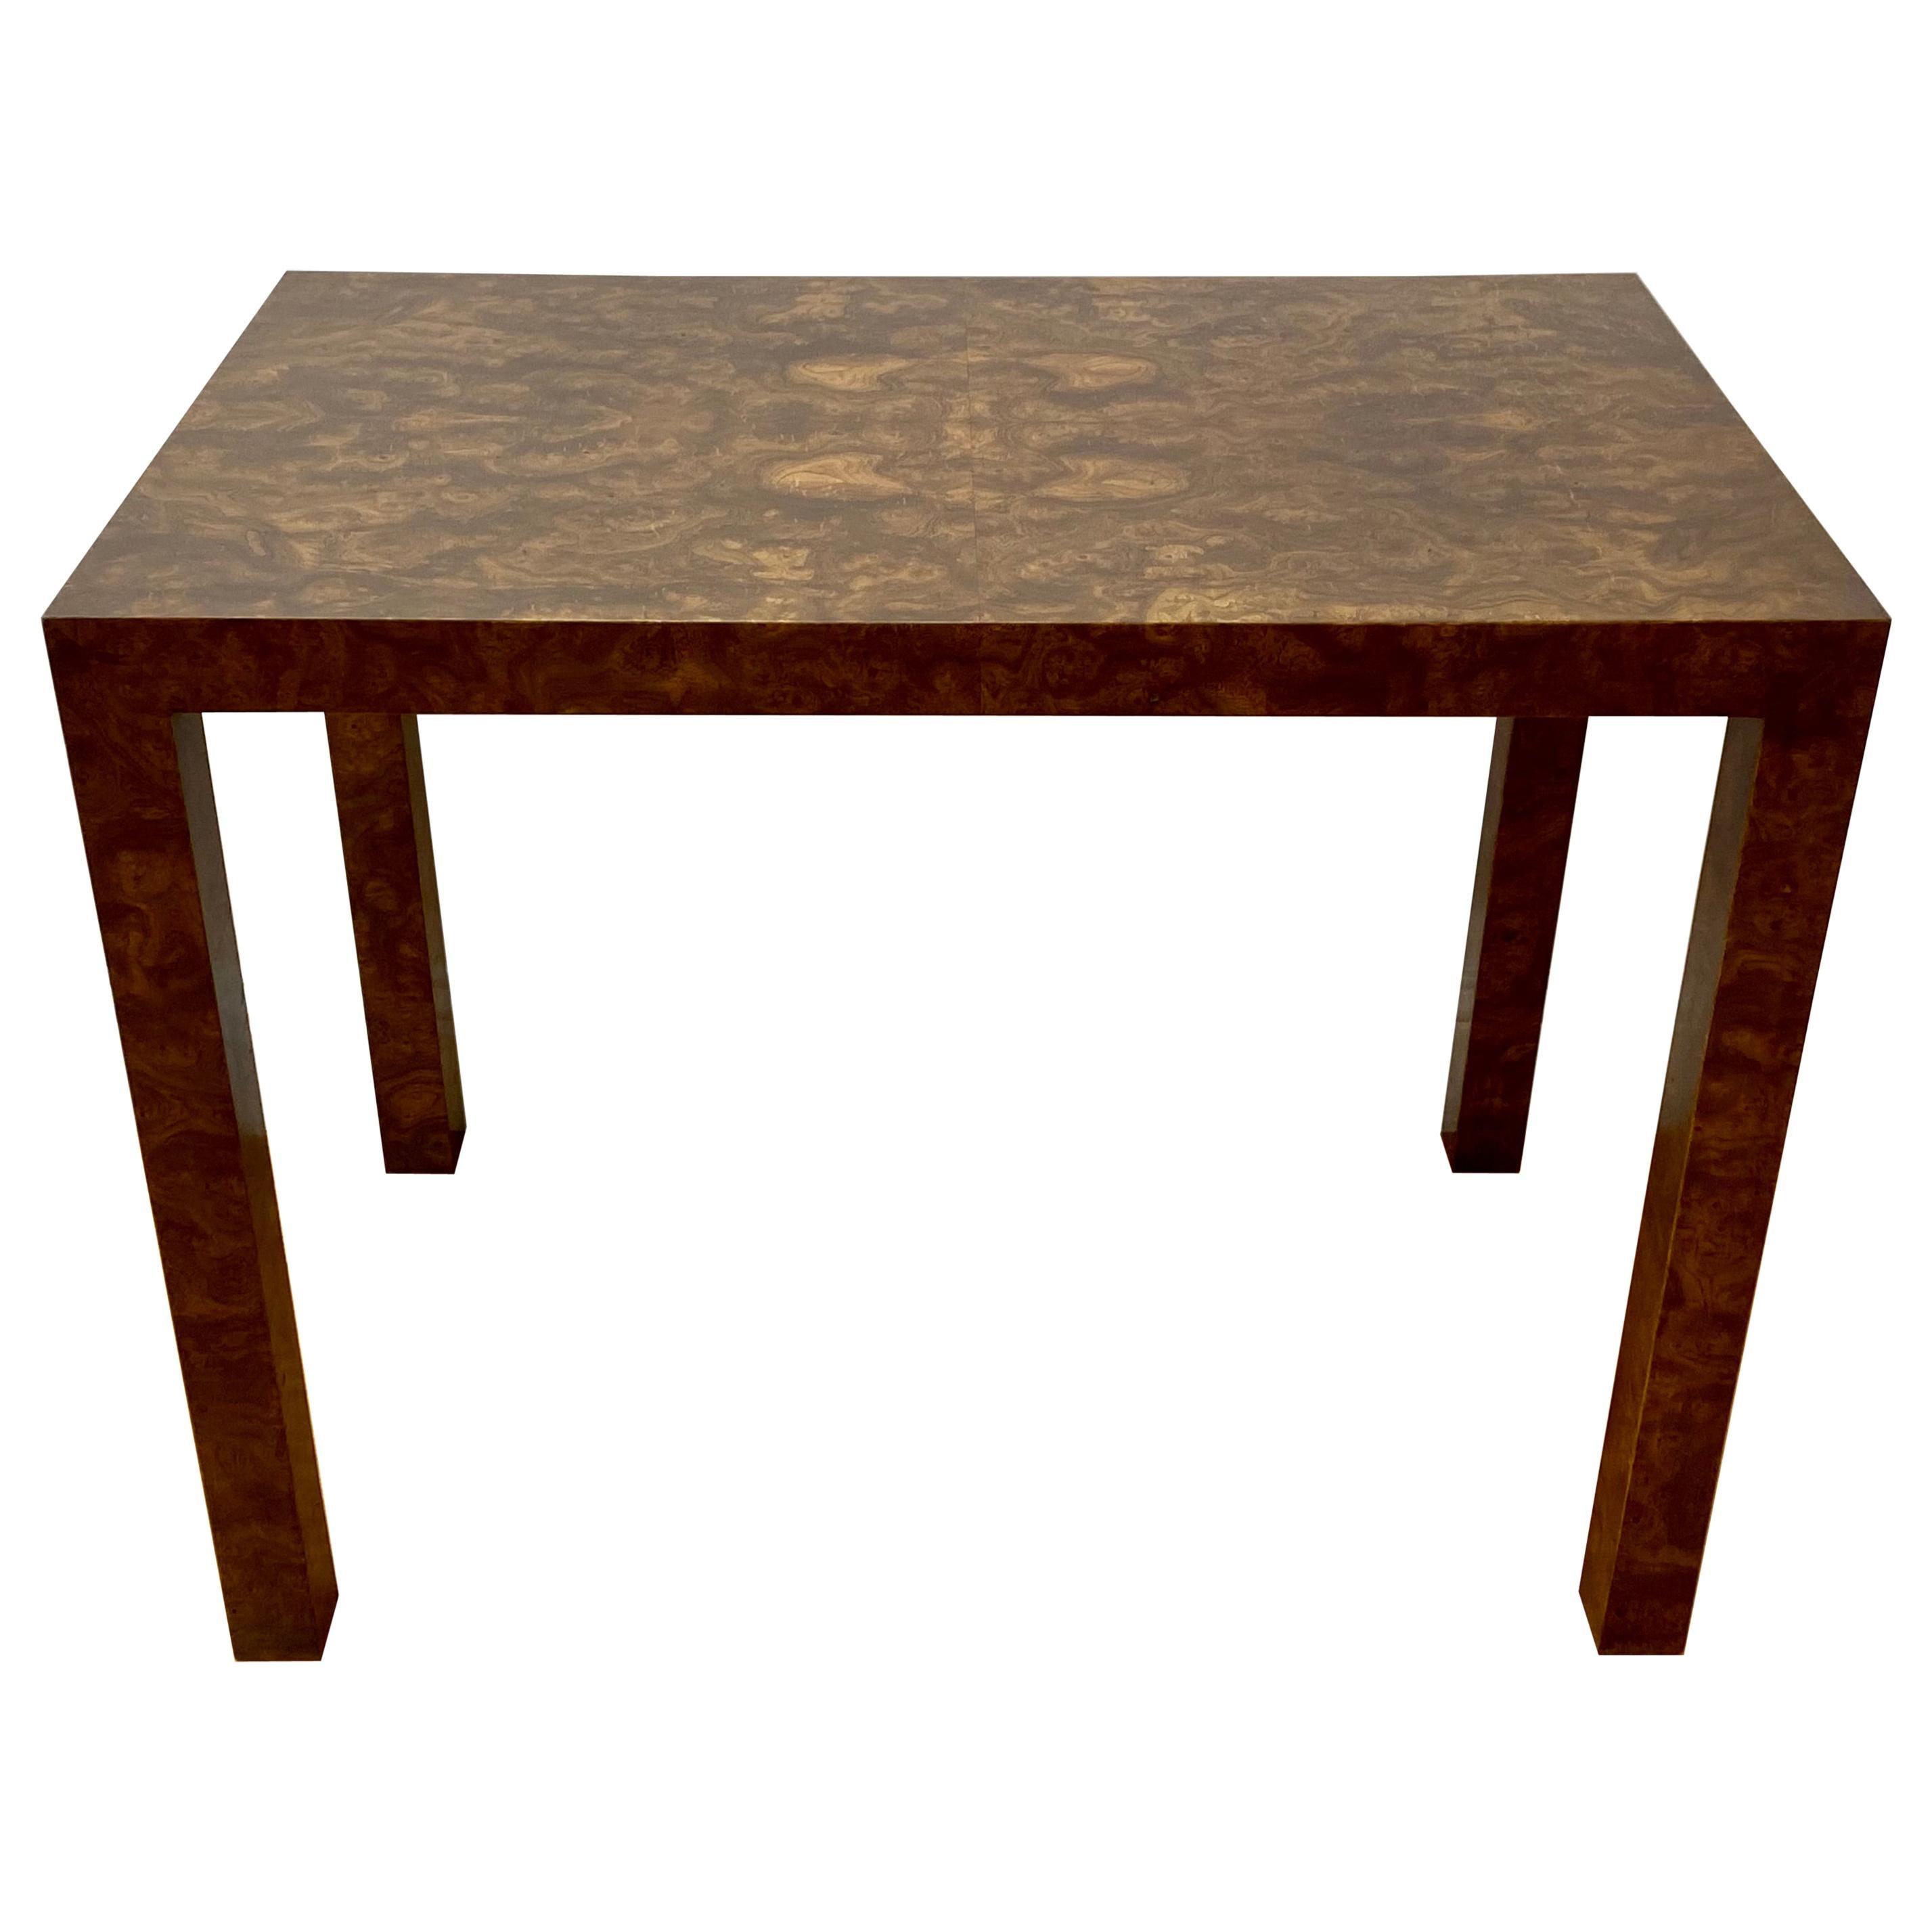 Vintage Burl Walnut Side / Console Table by Milo Baughman, c.1970